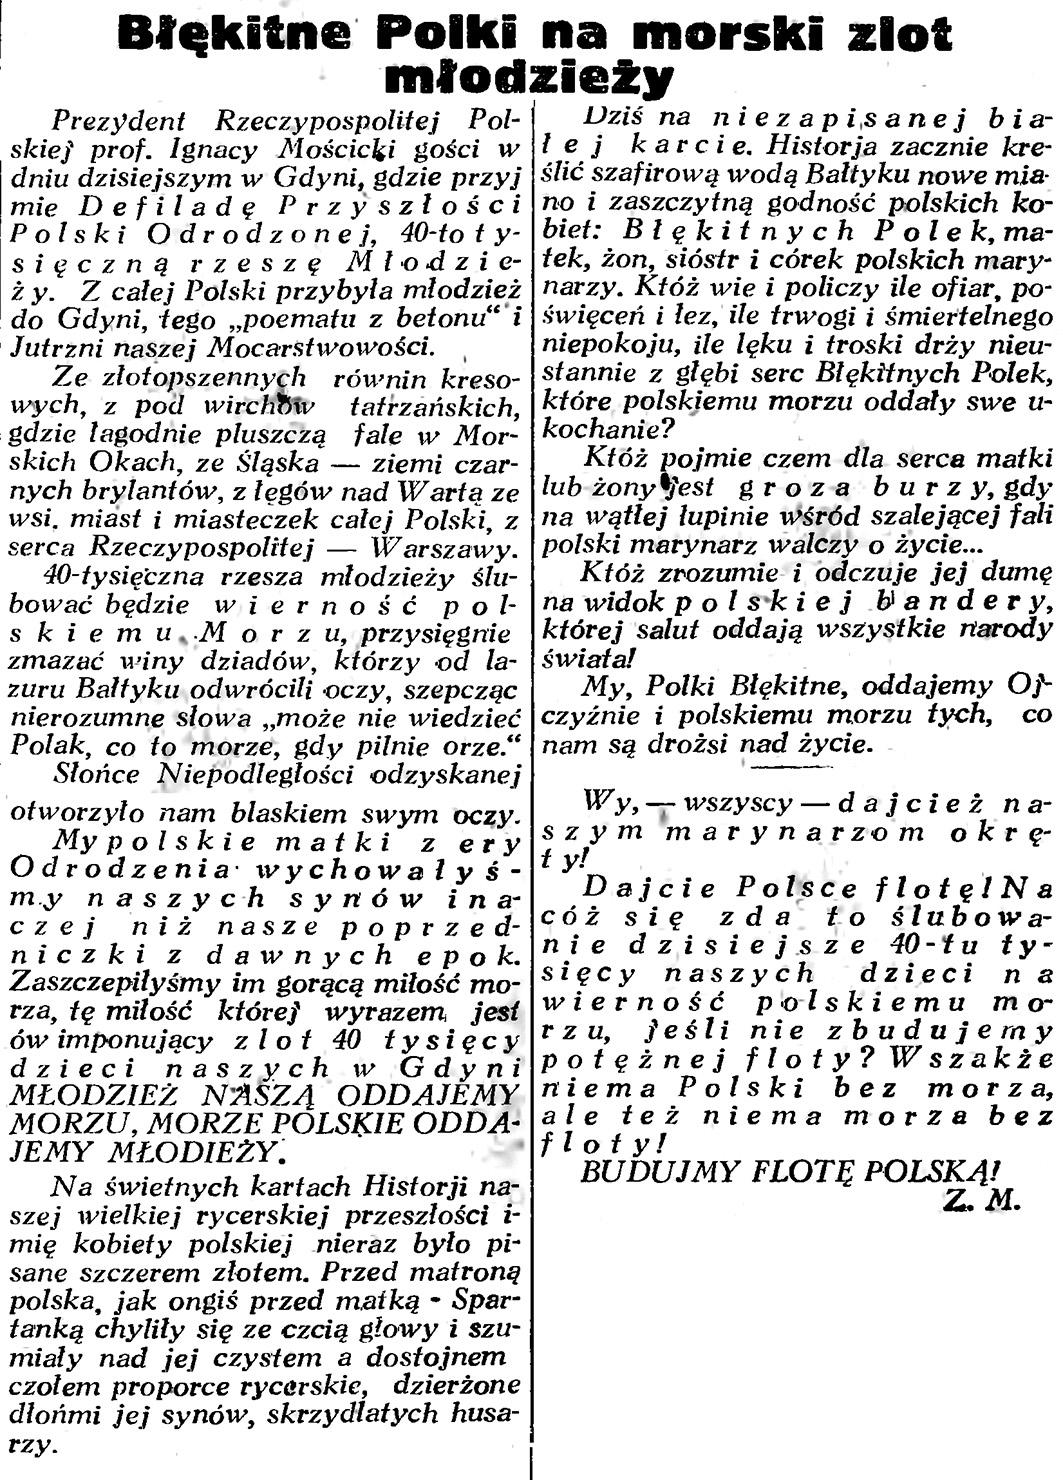 Błękitne Polski na morski zlot młodzieży // Gazeta Gdańska. - 1934, nr 144, s. 2